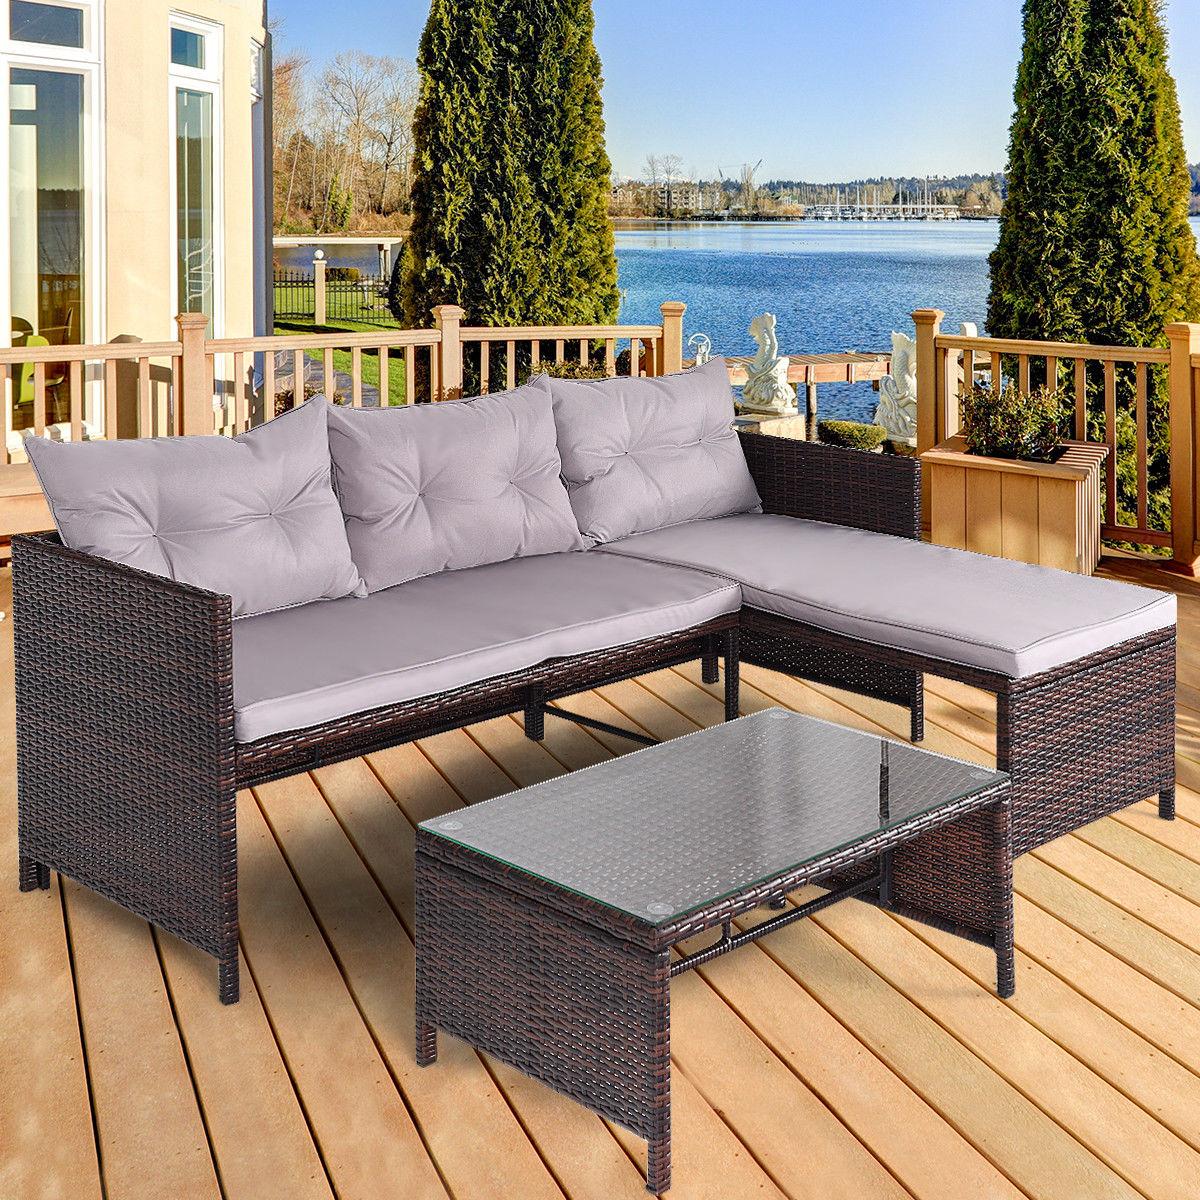 Costway 3 PCS Outdoor Rattan Furniture Sofa Set Lounge Chaise